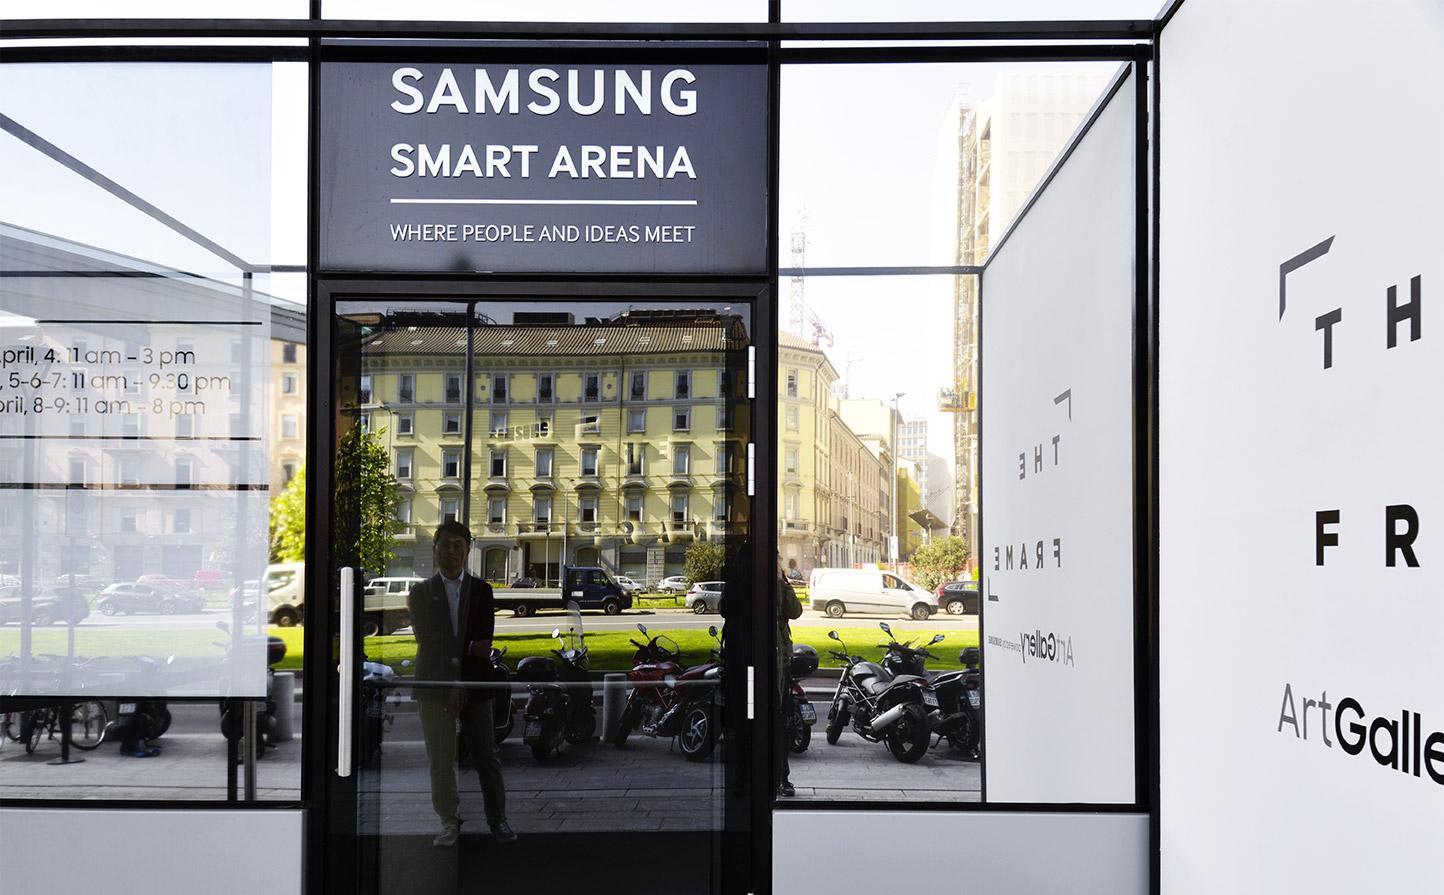 The frame fuorisalone 2017 timor sanz for Samsung arena milano